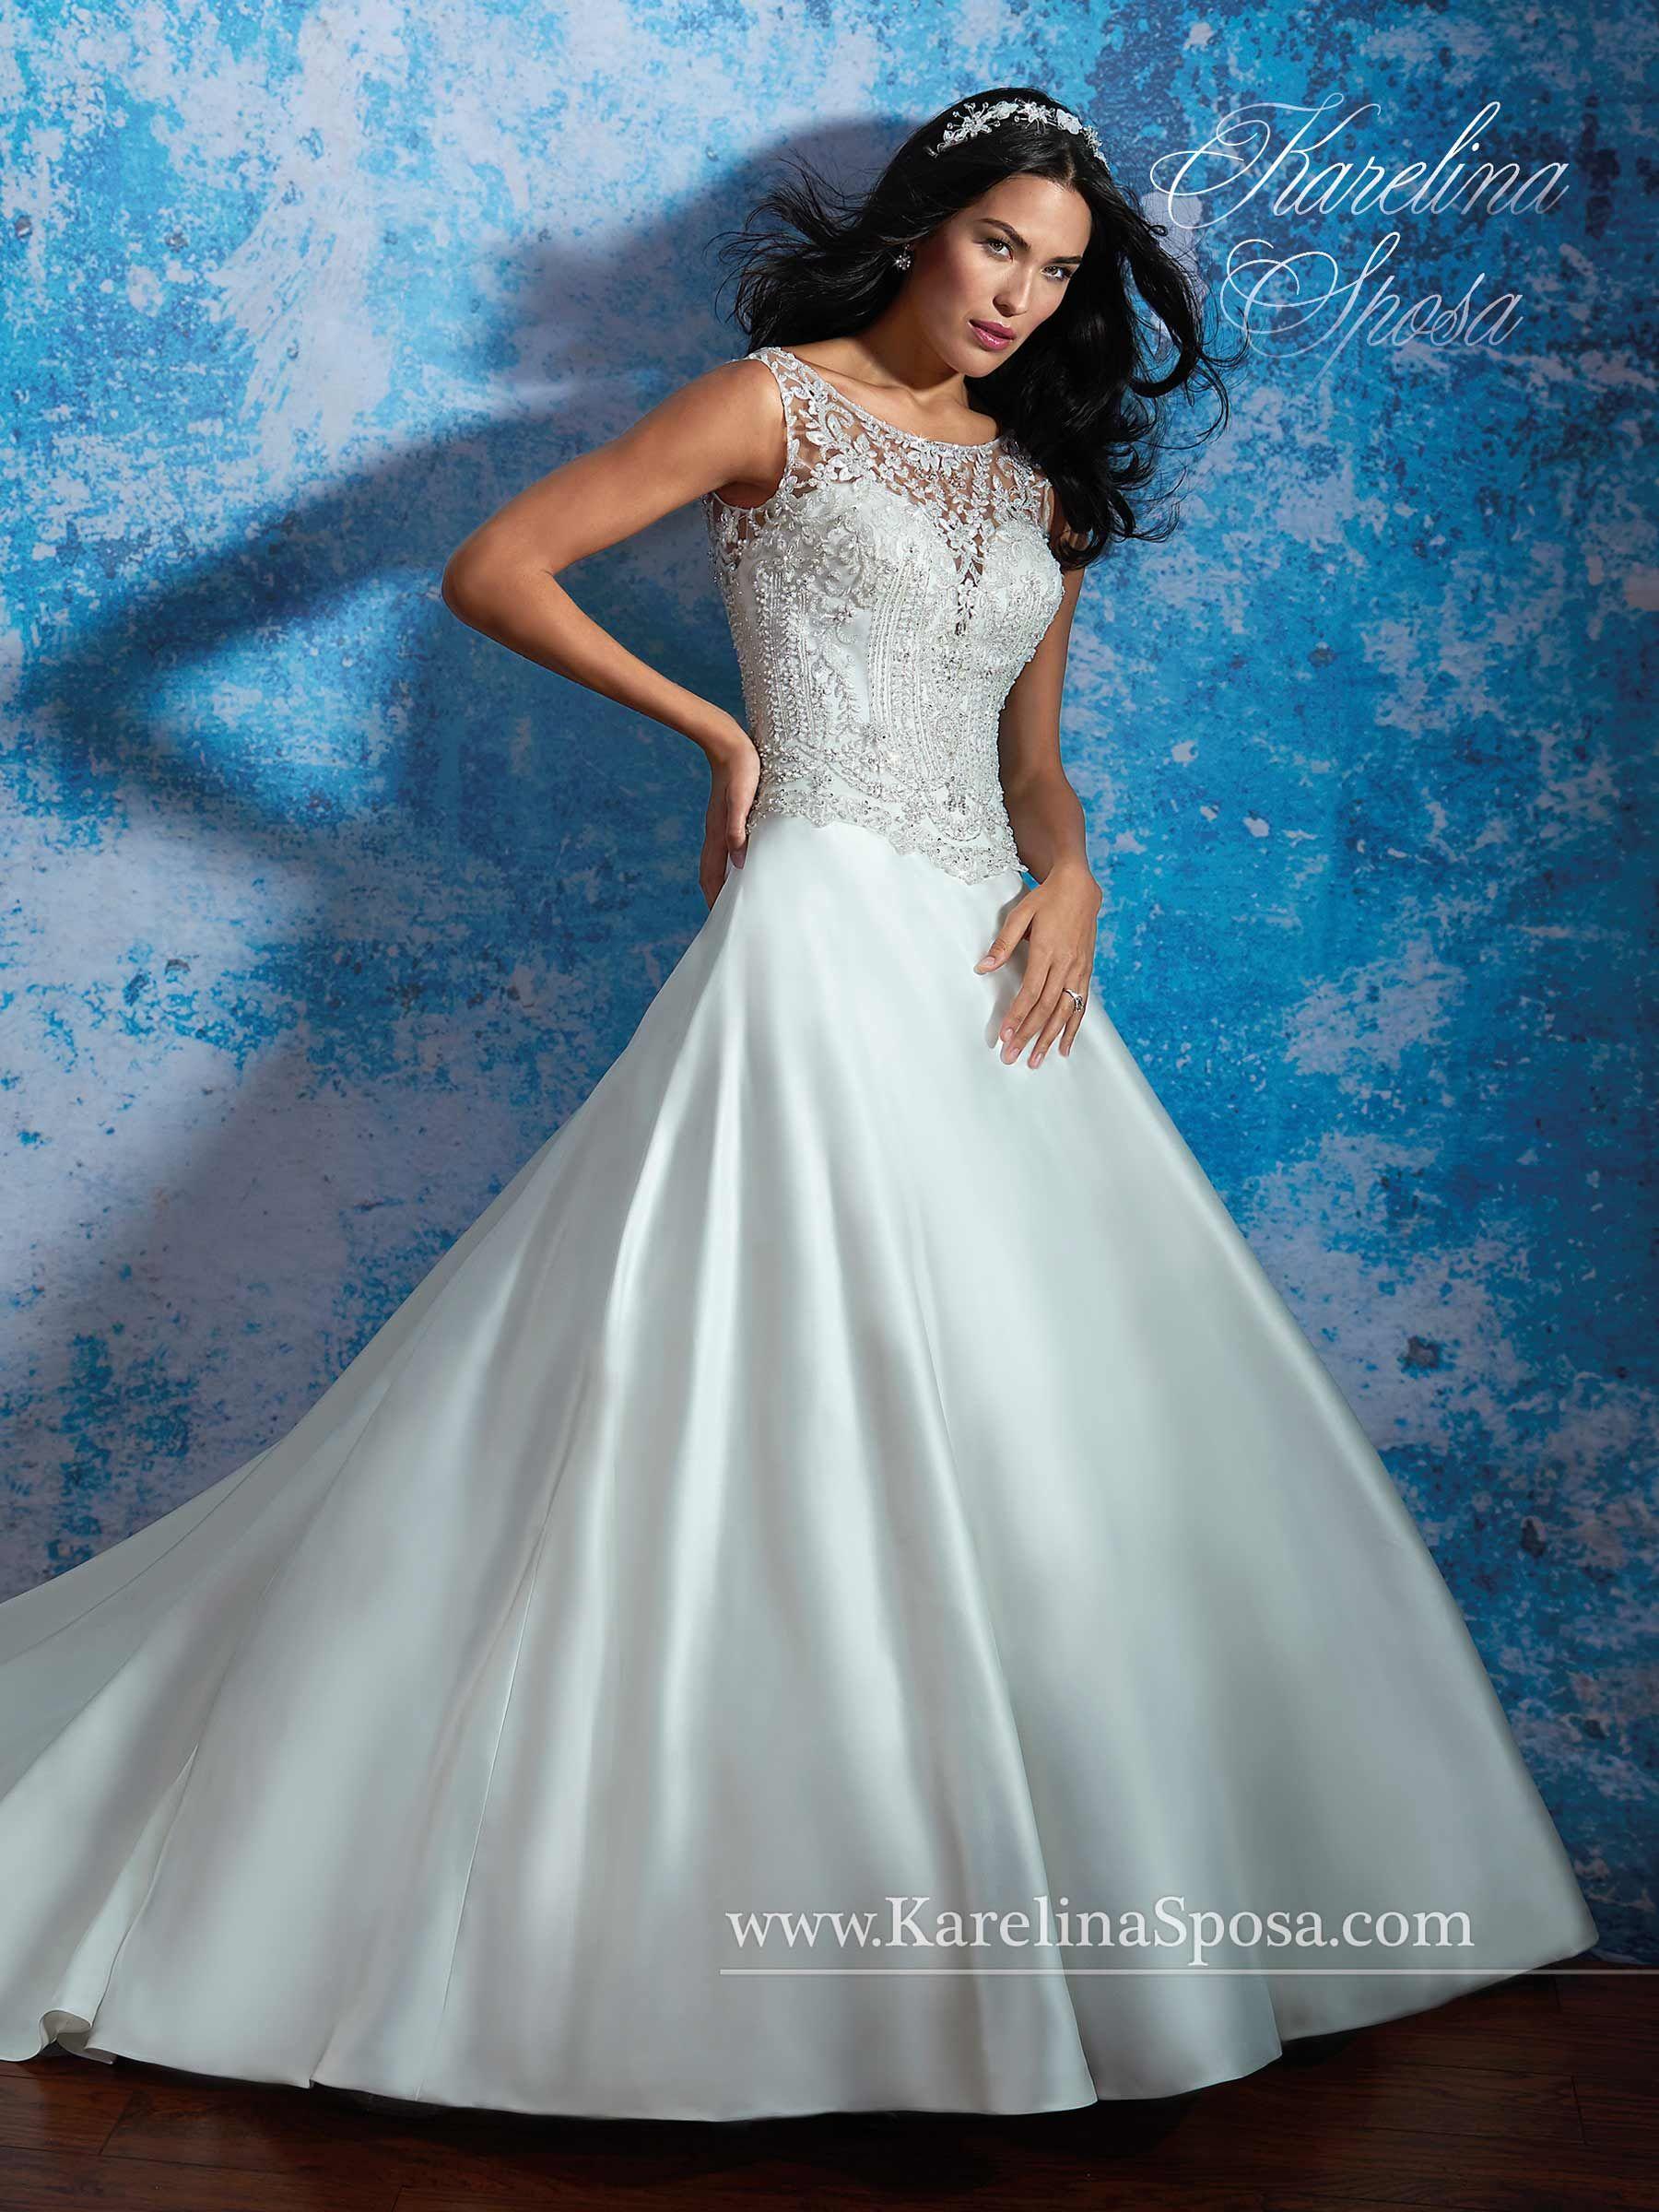 Amazing Bridesmaid Dresses Fresno Ca Illustration - All Wedding ...